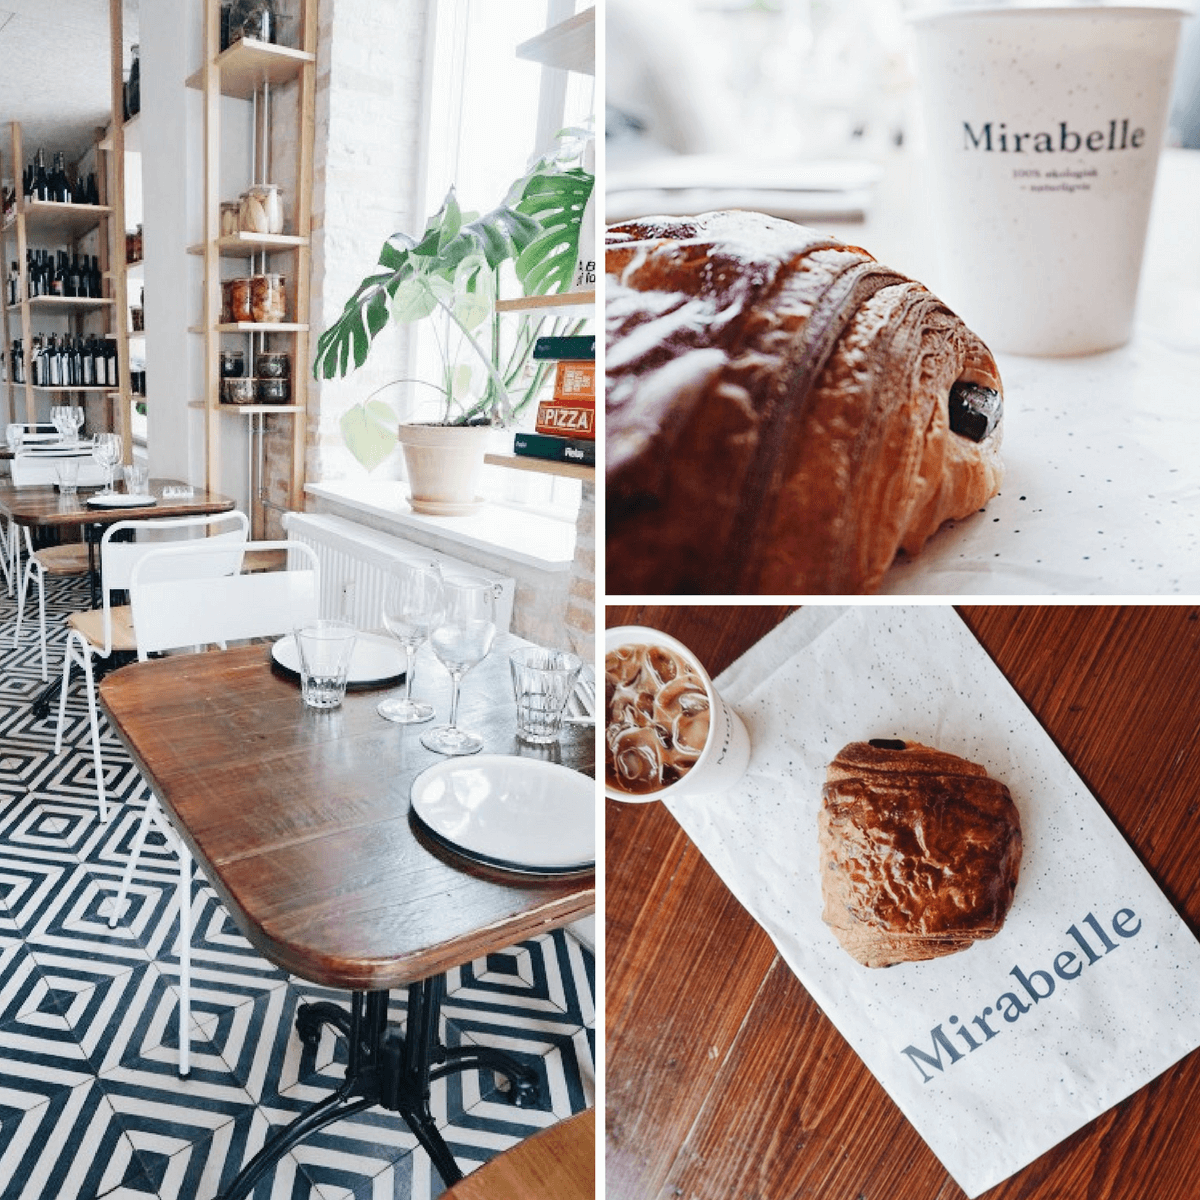 Mirabelle Bakery in Copenhagen, Denmark